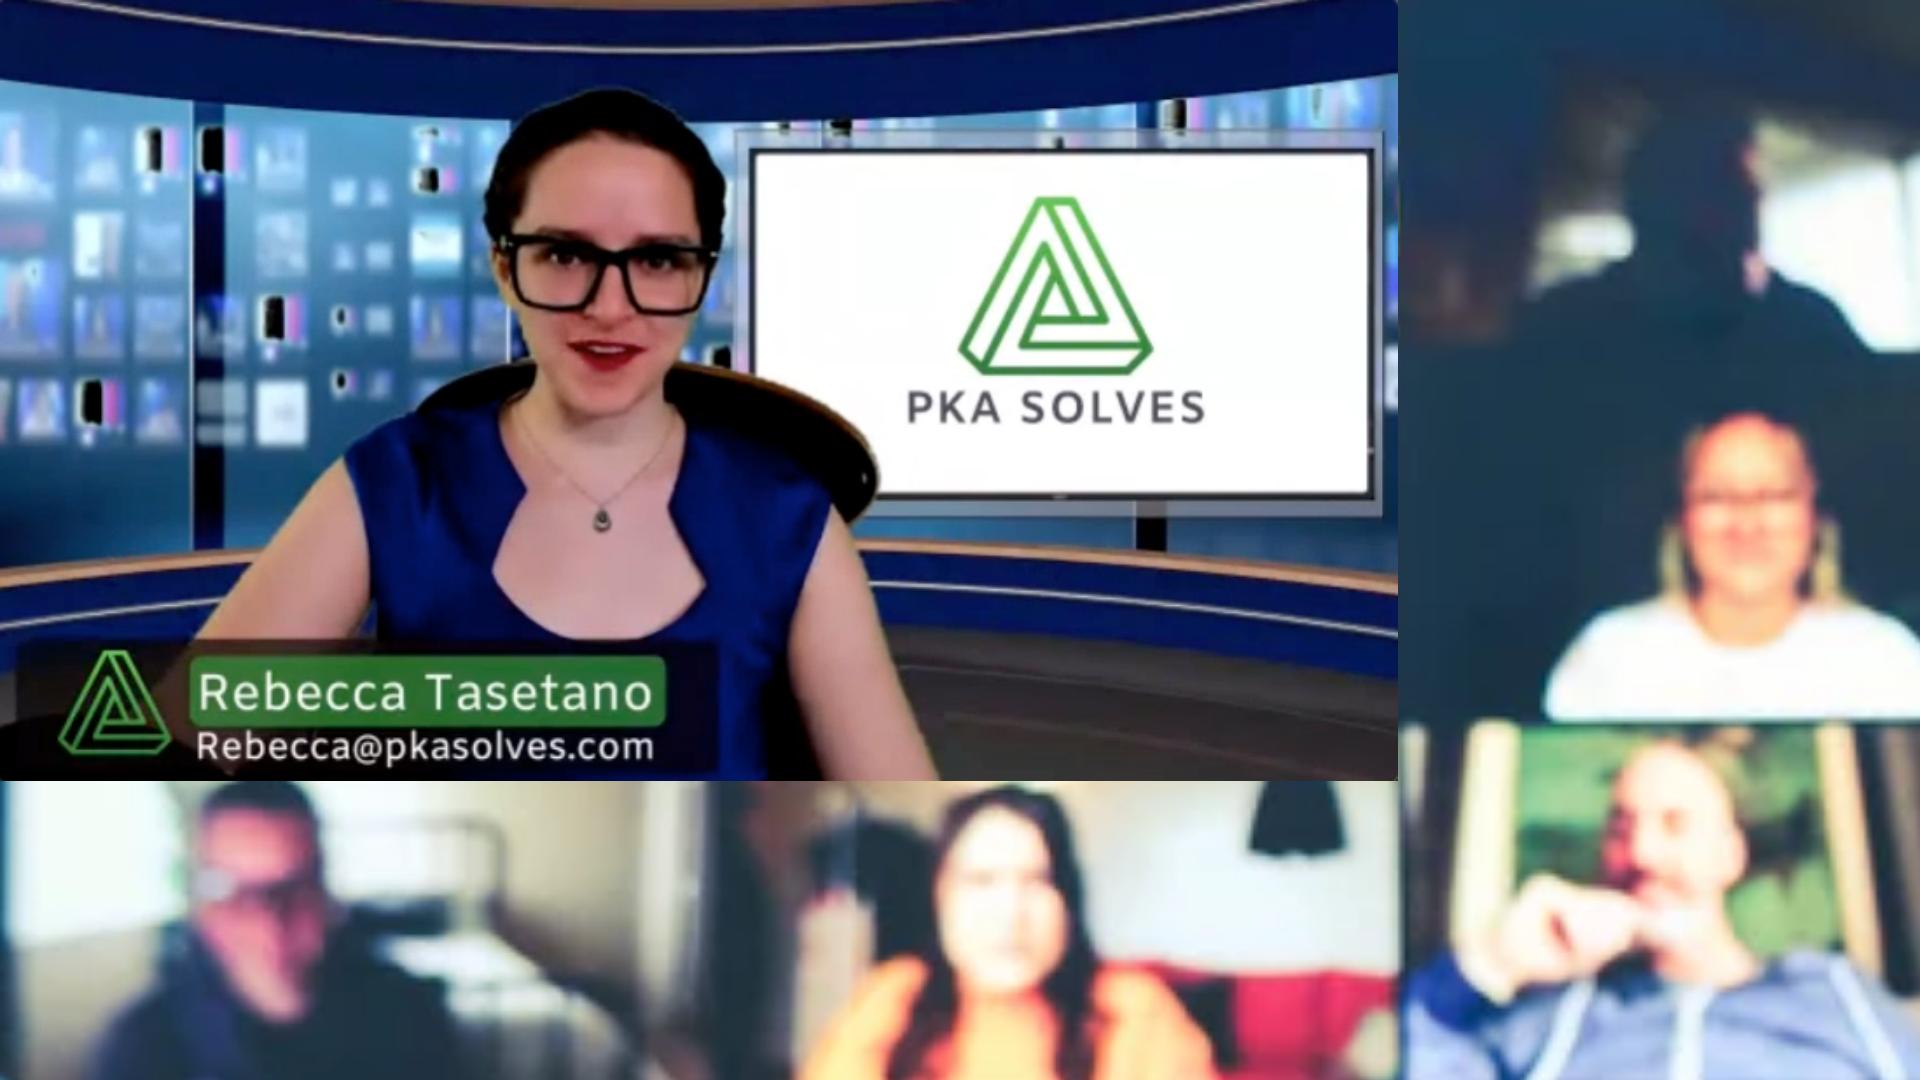 PKA Solves hosts a virtual event